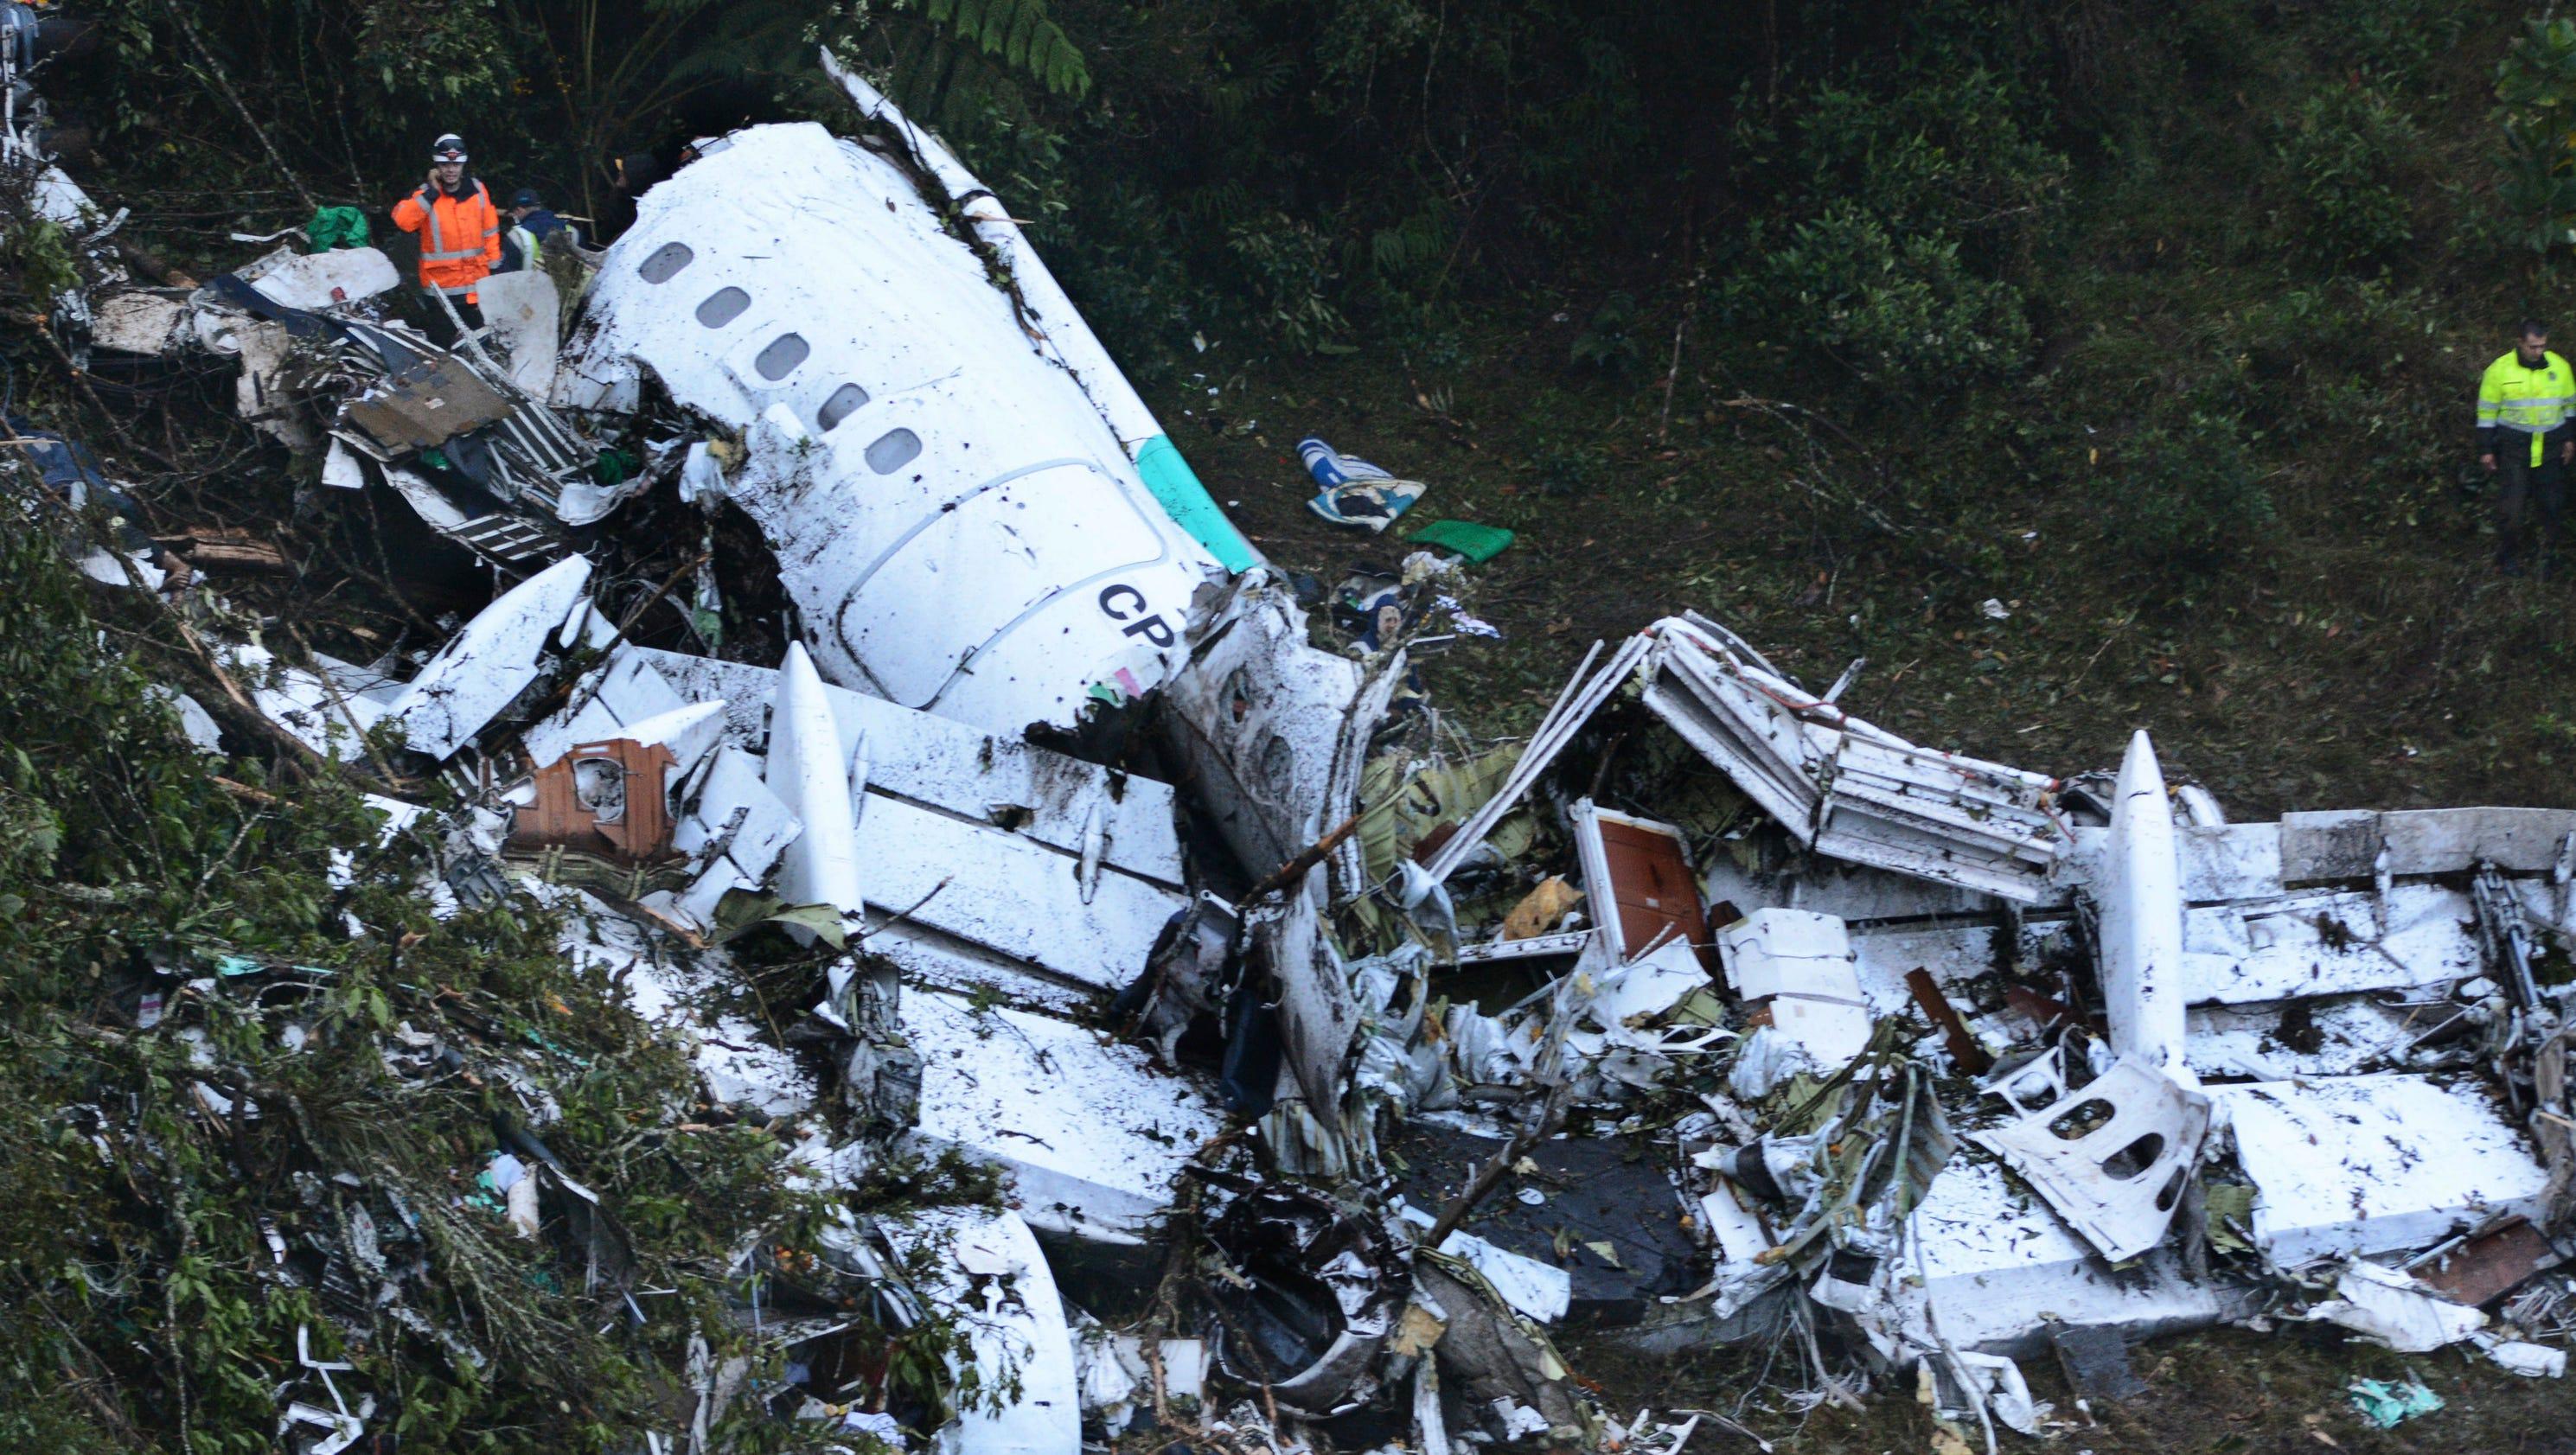 636160058132498155-ap-aptopix-colombia-air-crash